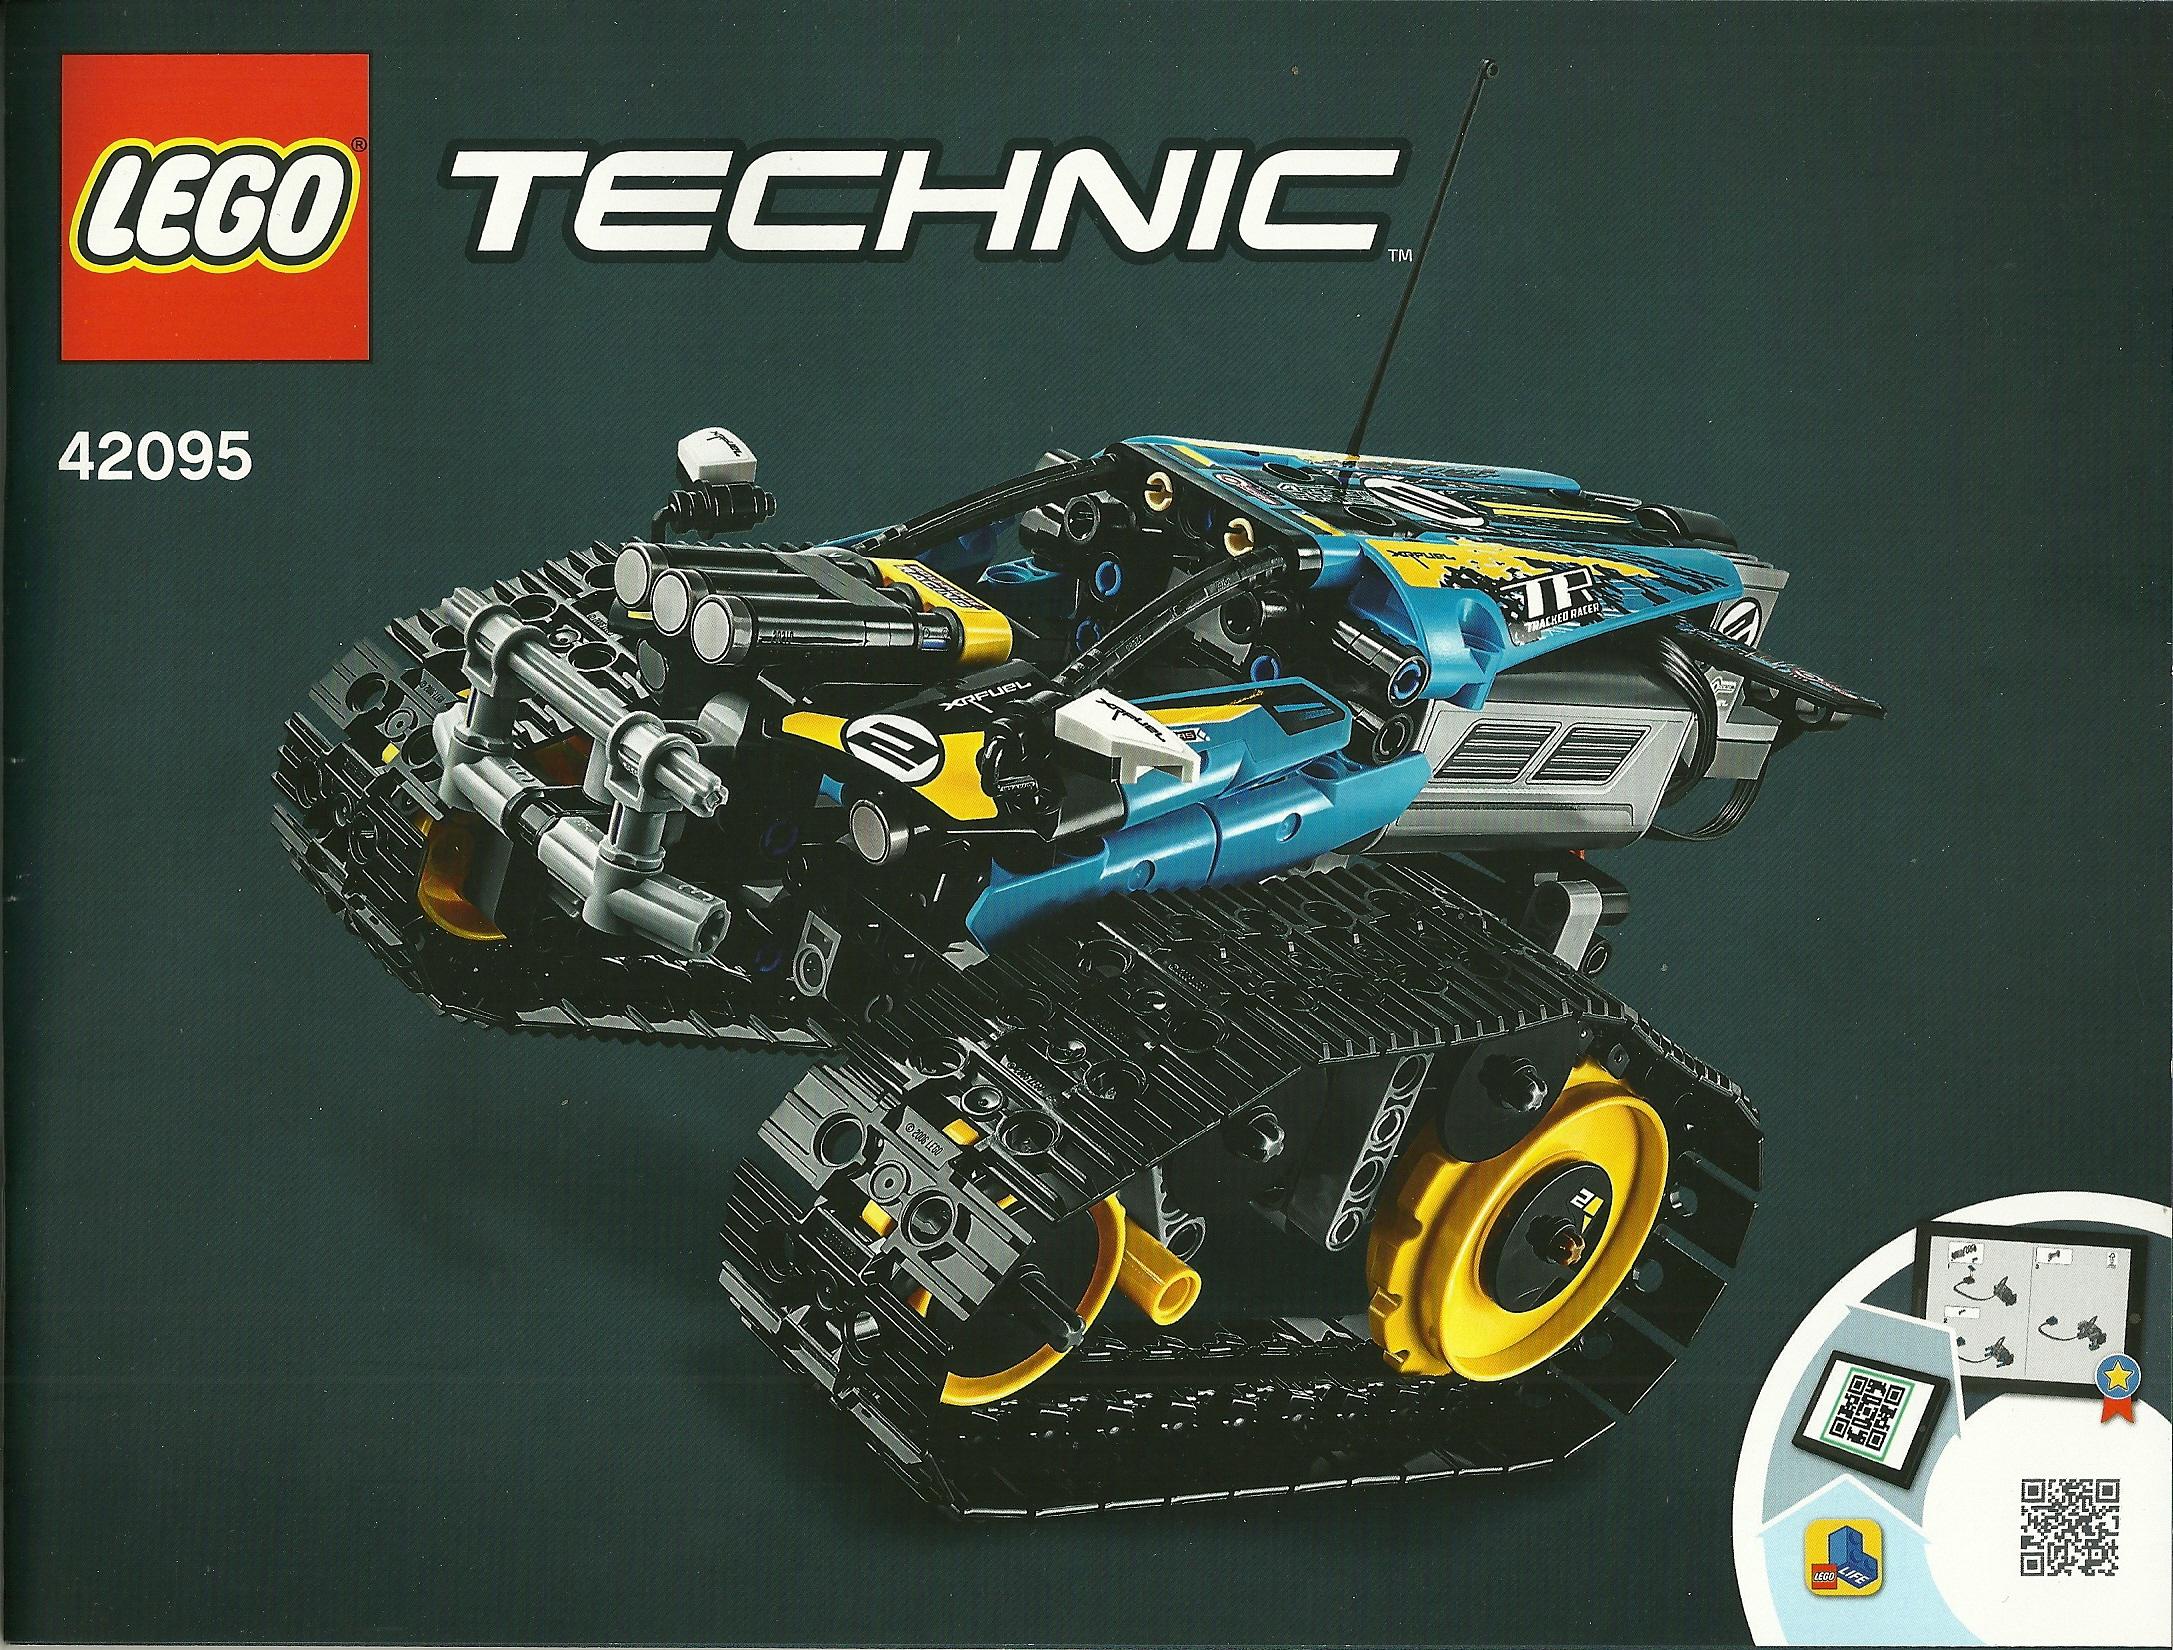 42095 LEGO Technic Bauanleitung Remote Controlled Stunt Racer Ferngesteuerter Stunt Racer